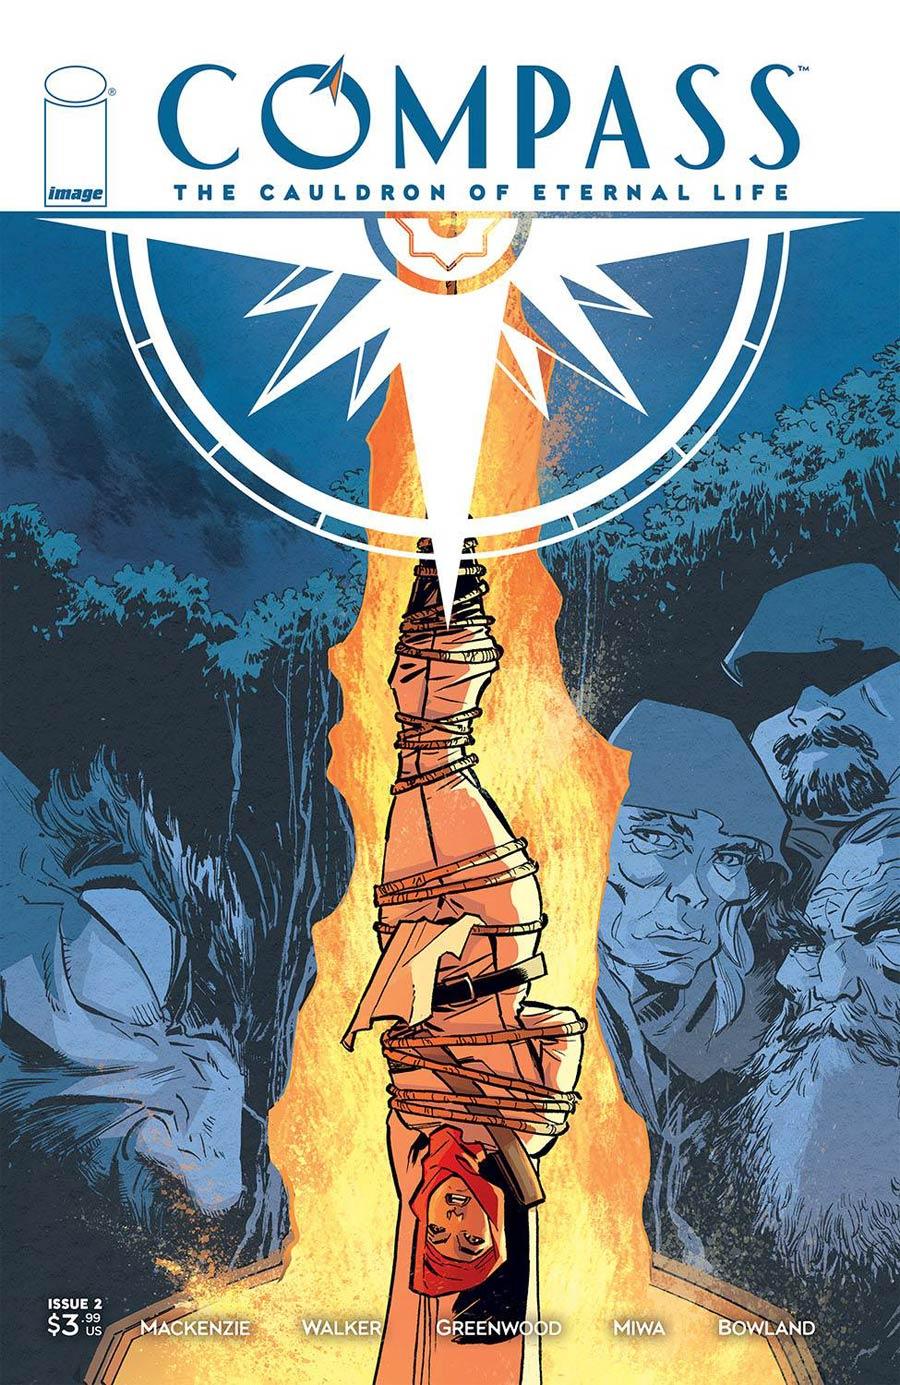 Compass Cauldron Of Eternal Life #2